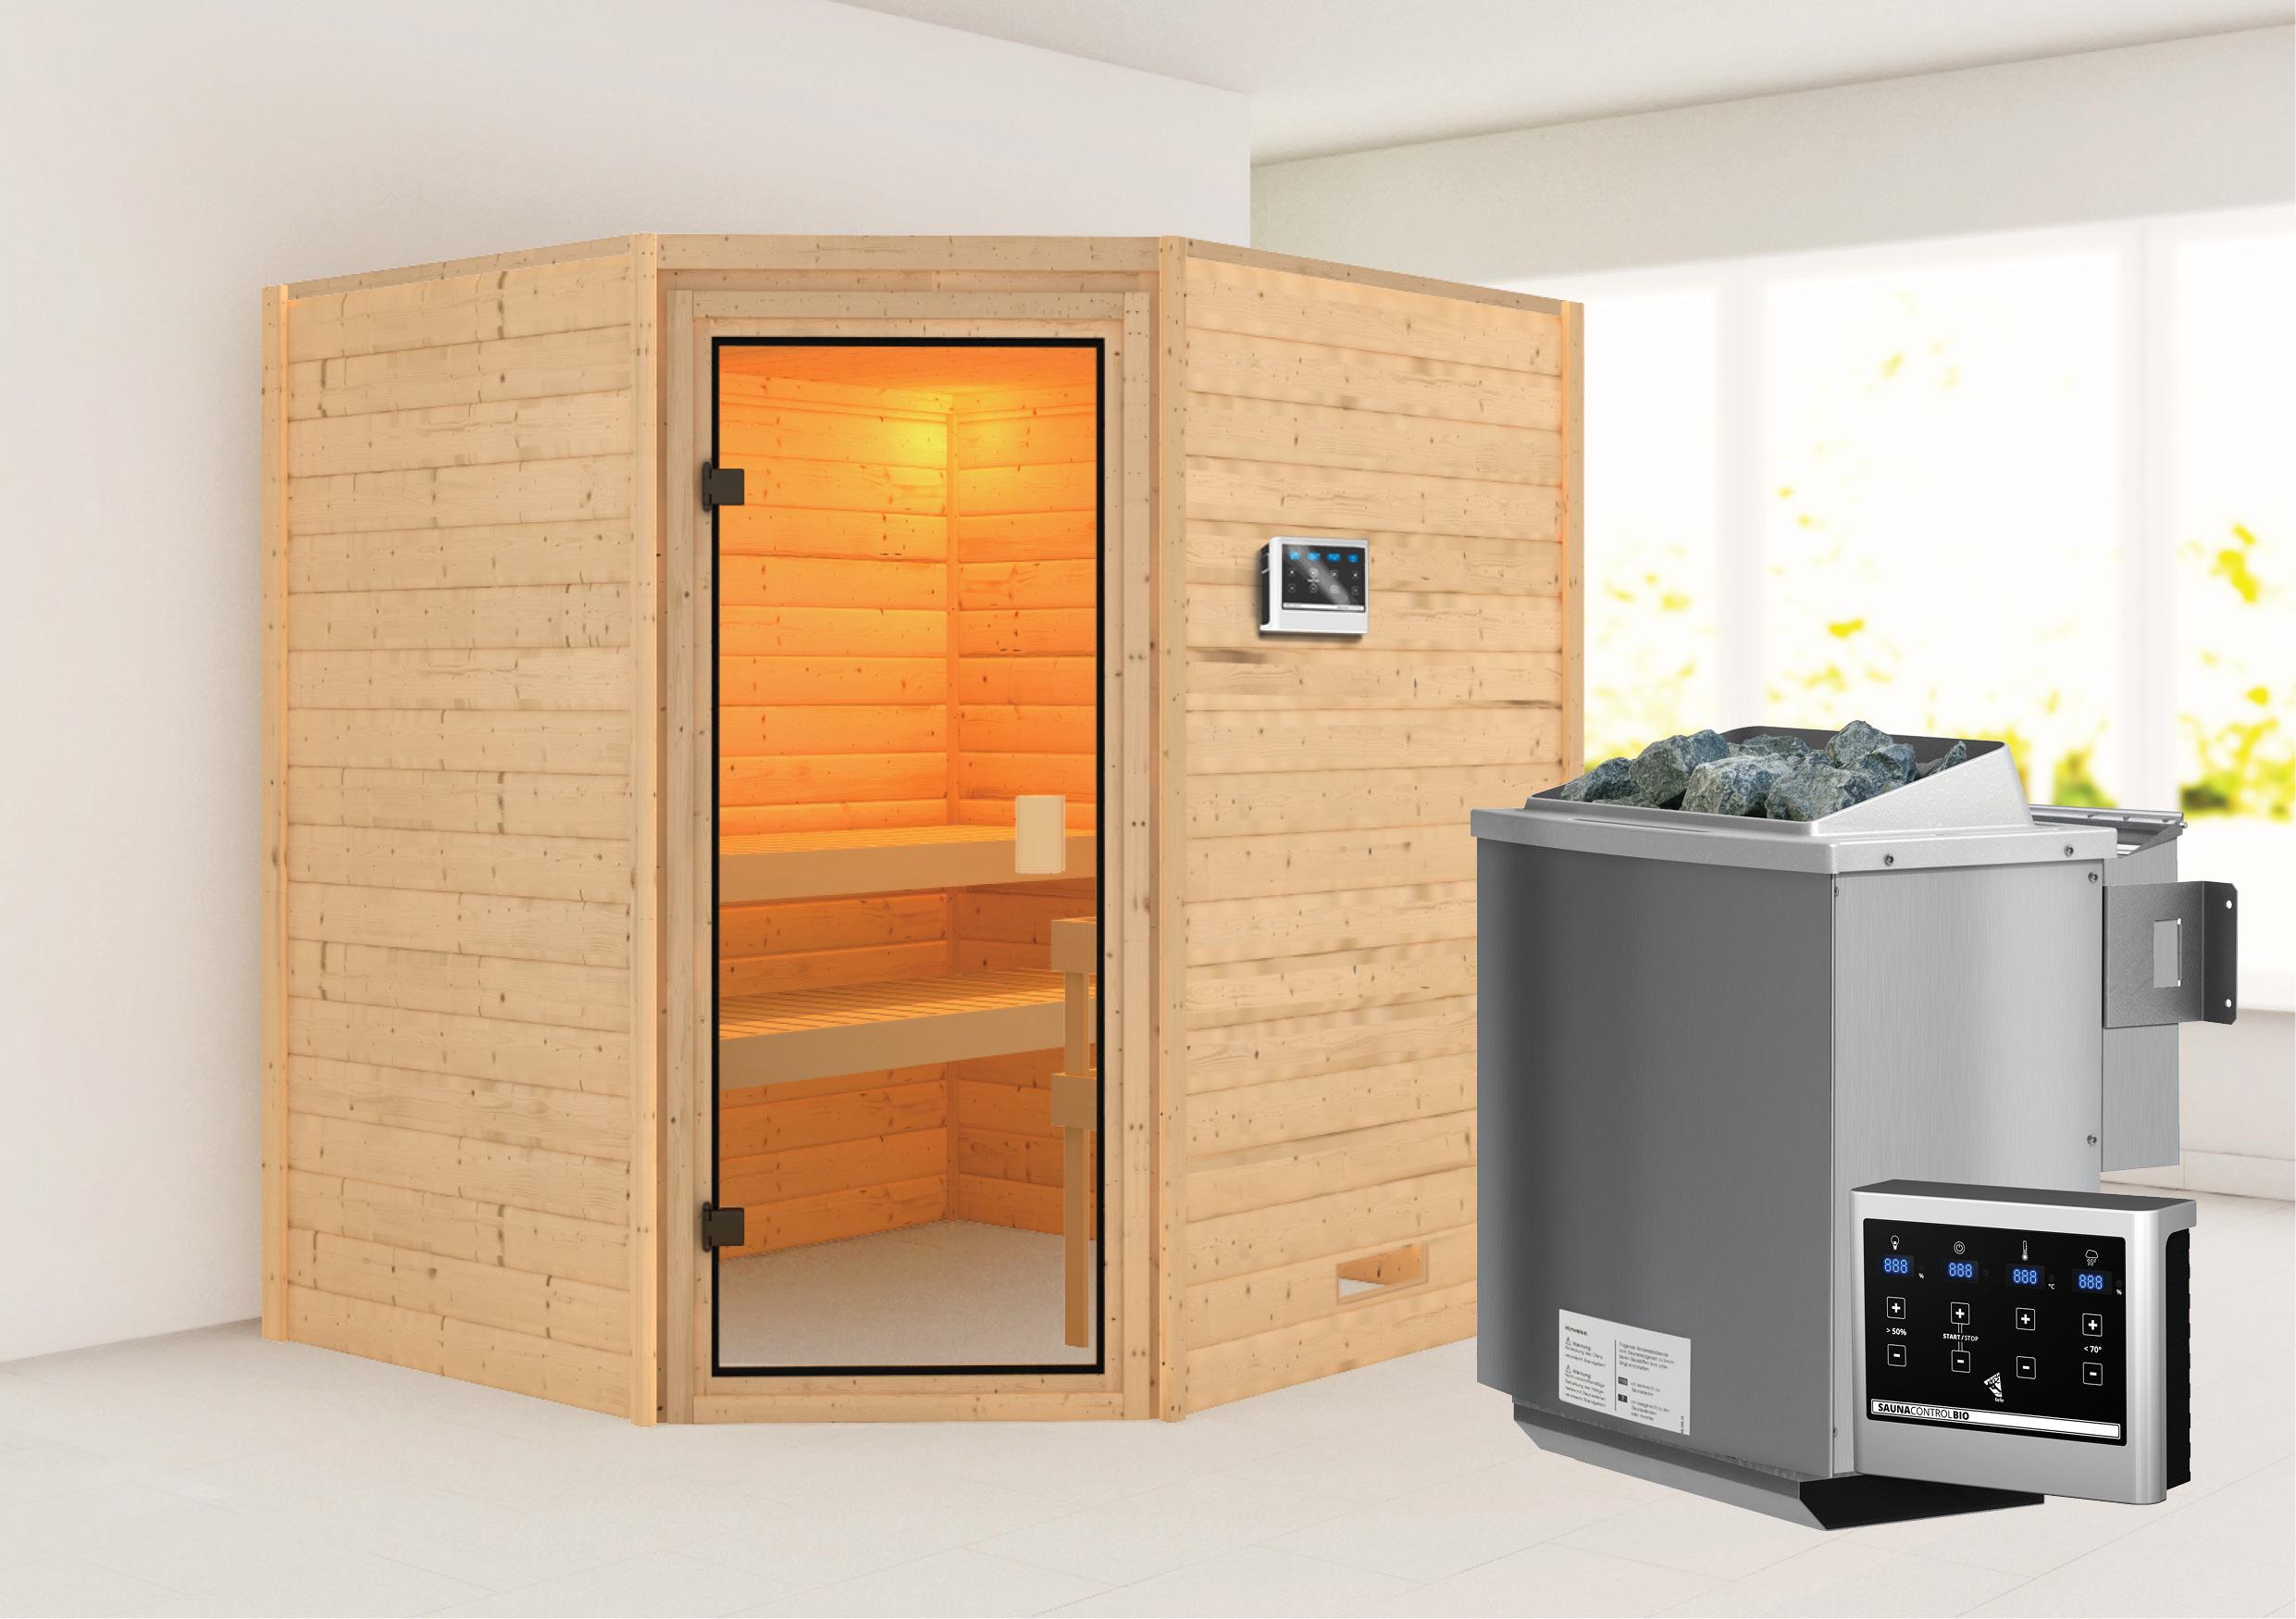 WoodFeeling Sauna Mia 38mm Bio Saunofen 9kW extern Classic Tür Bild 1